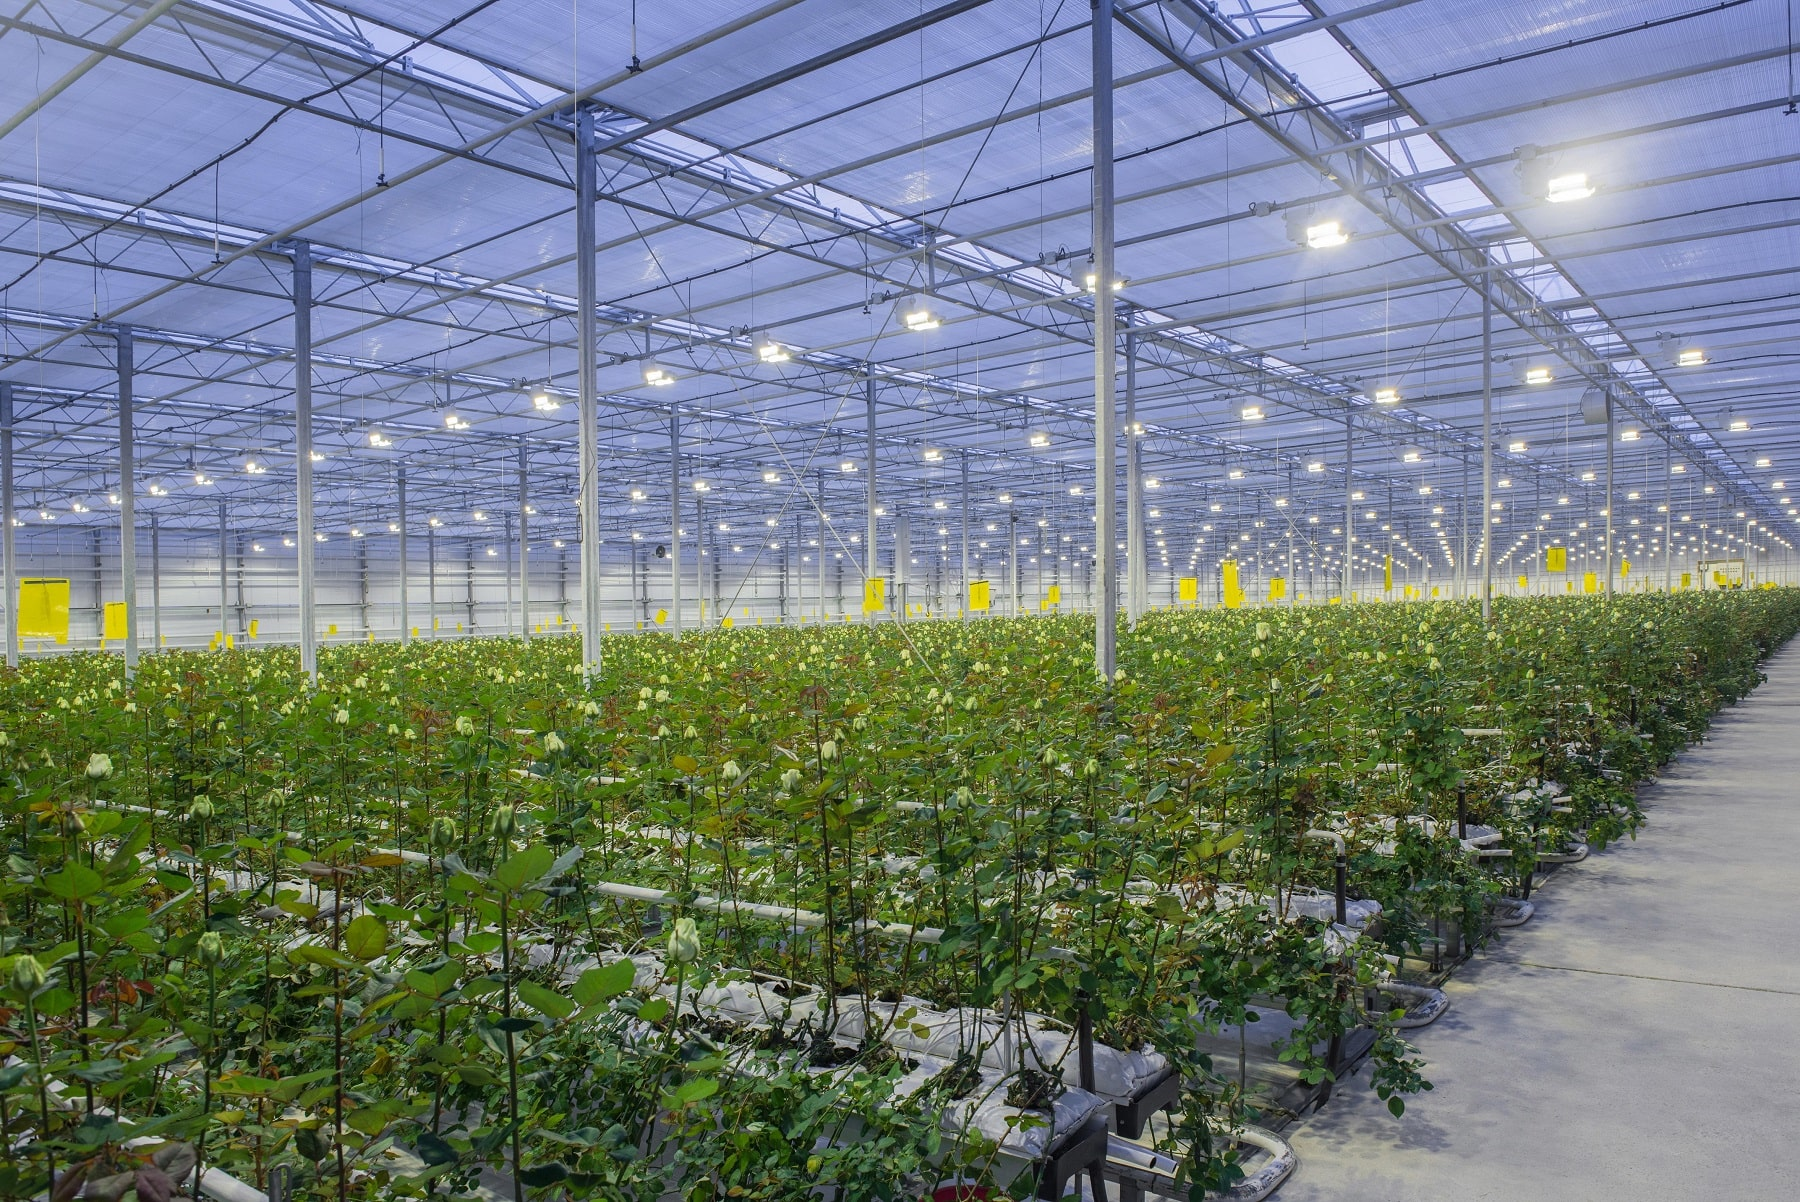 Smart Agriculture connectors